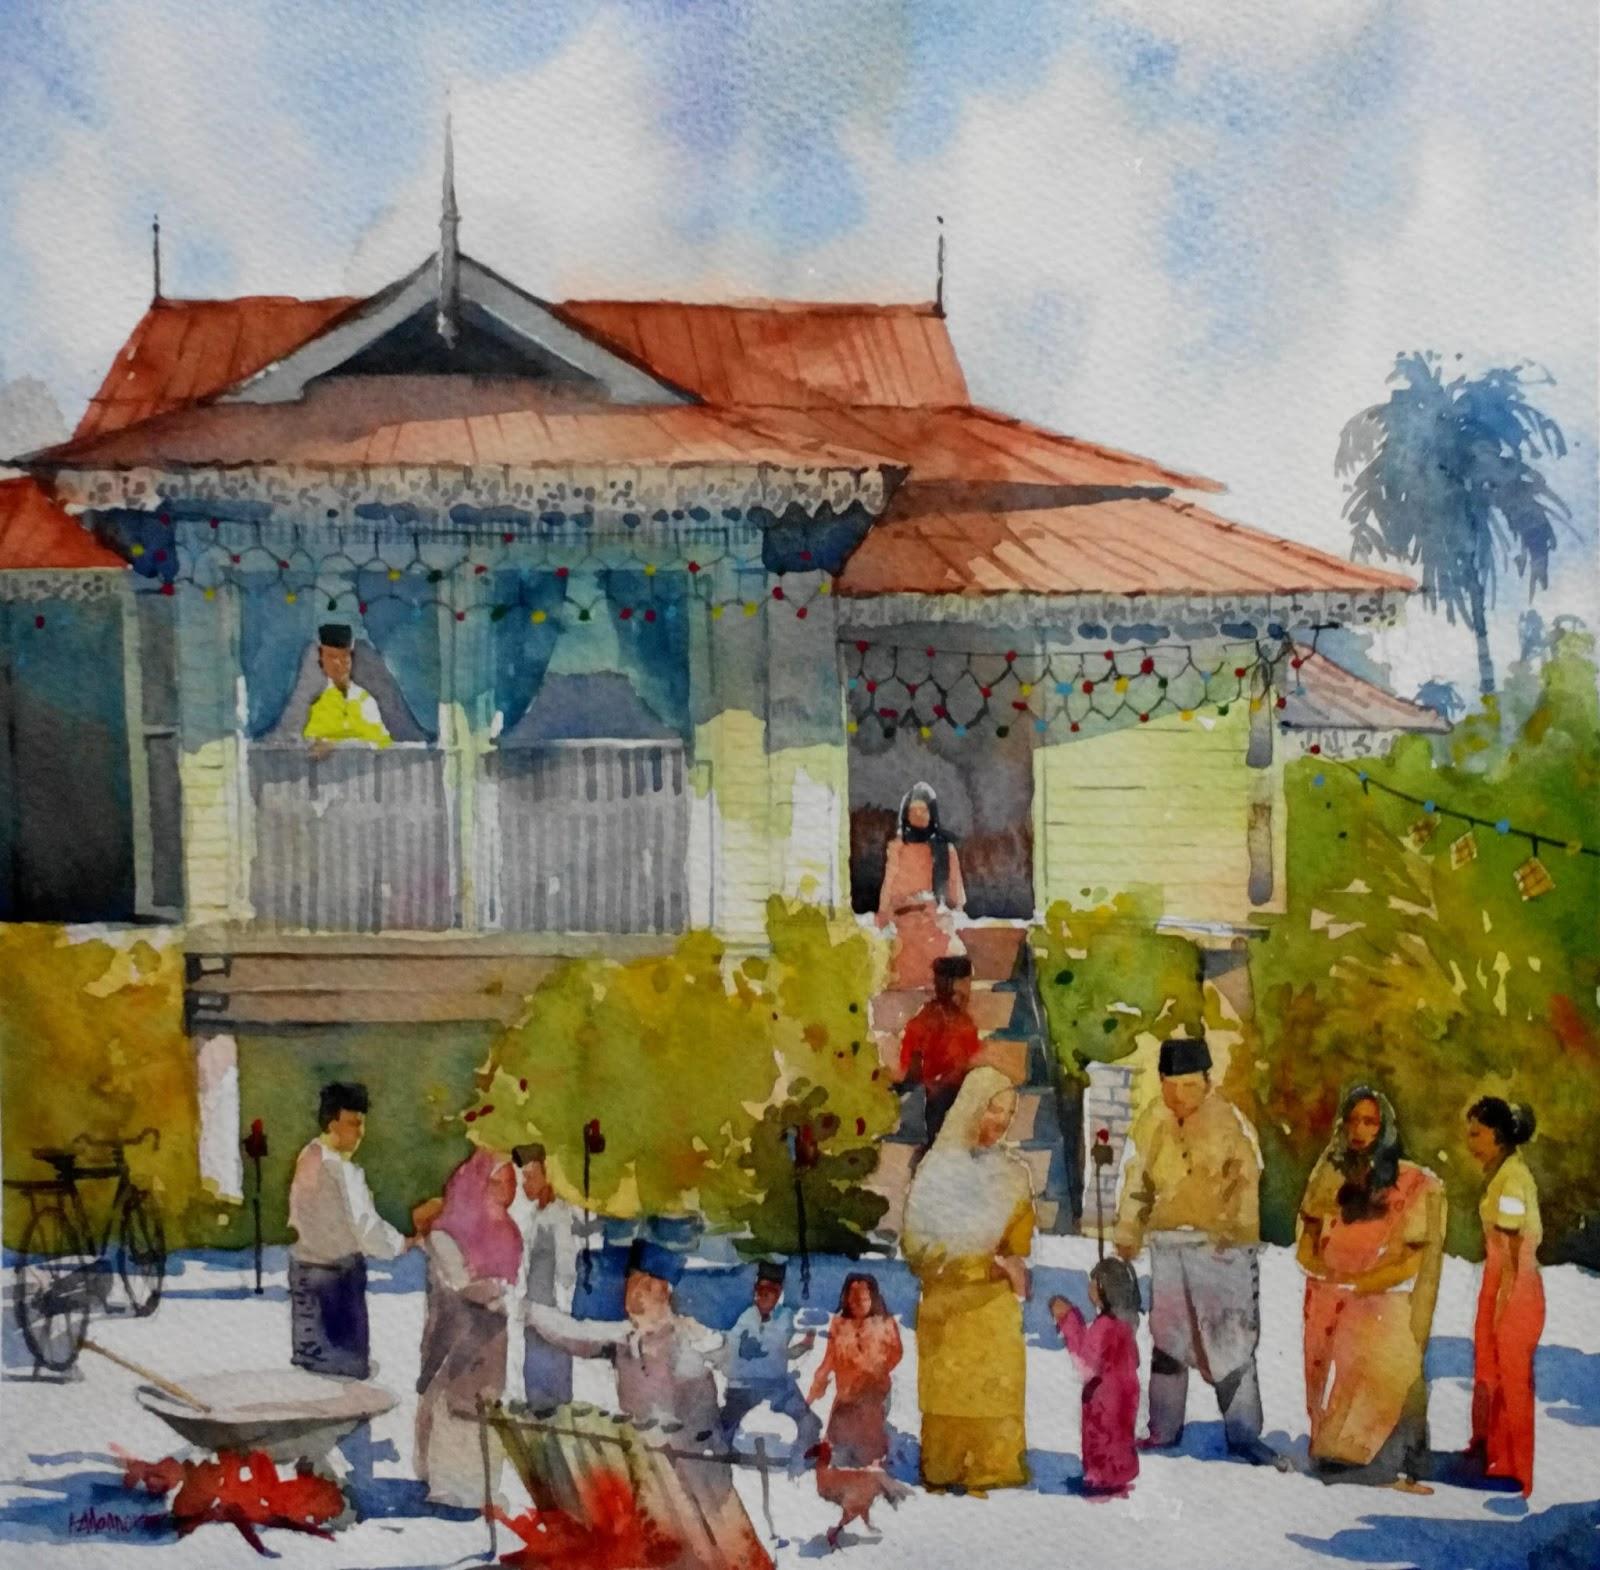 Lukisan Rumah Kampung Raya Cikimm Com